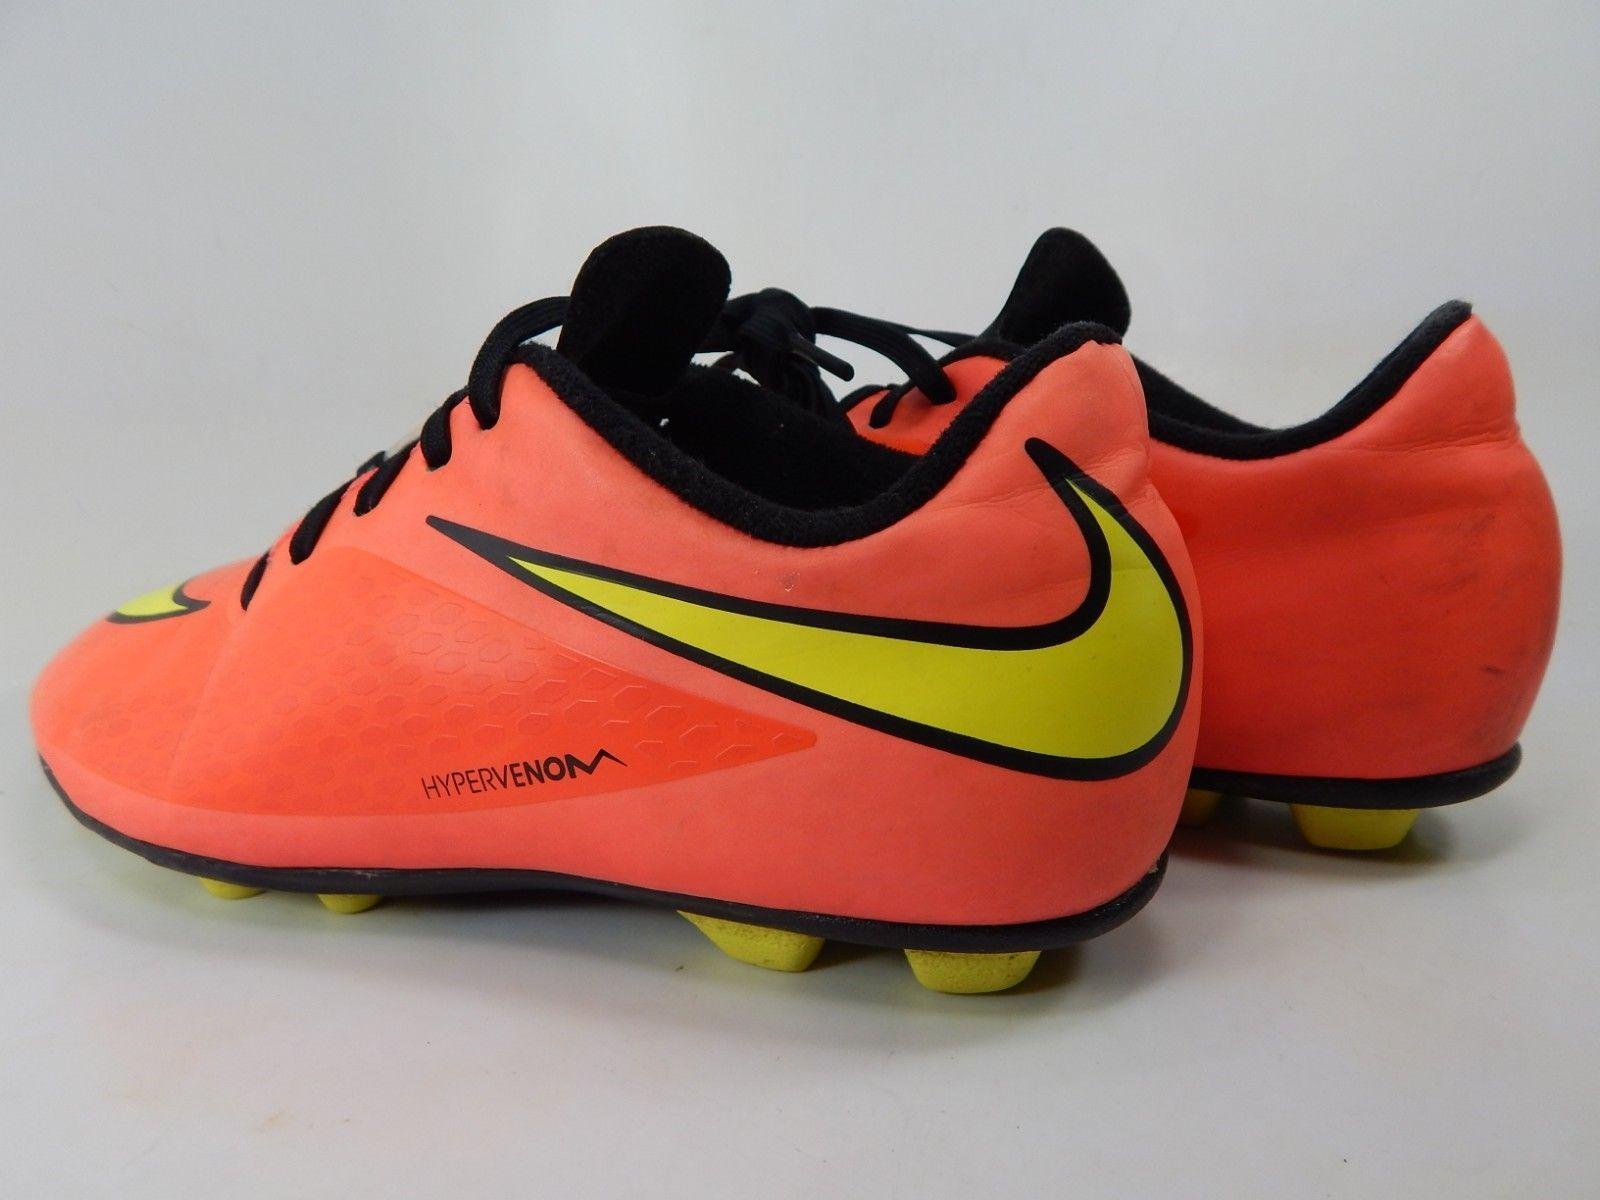 Nike Hypervenom Fade FG Big Kids Size 4 Y EU 36  Youth Boy's Girl's Soccer Cleat